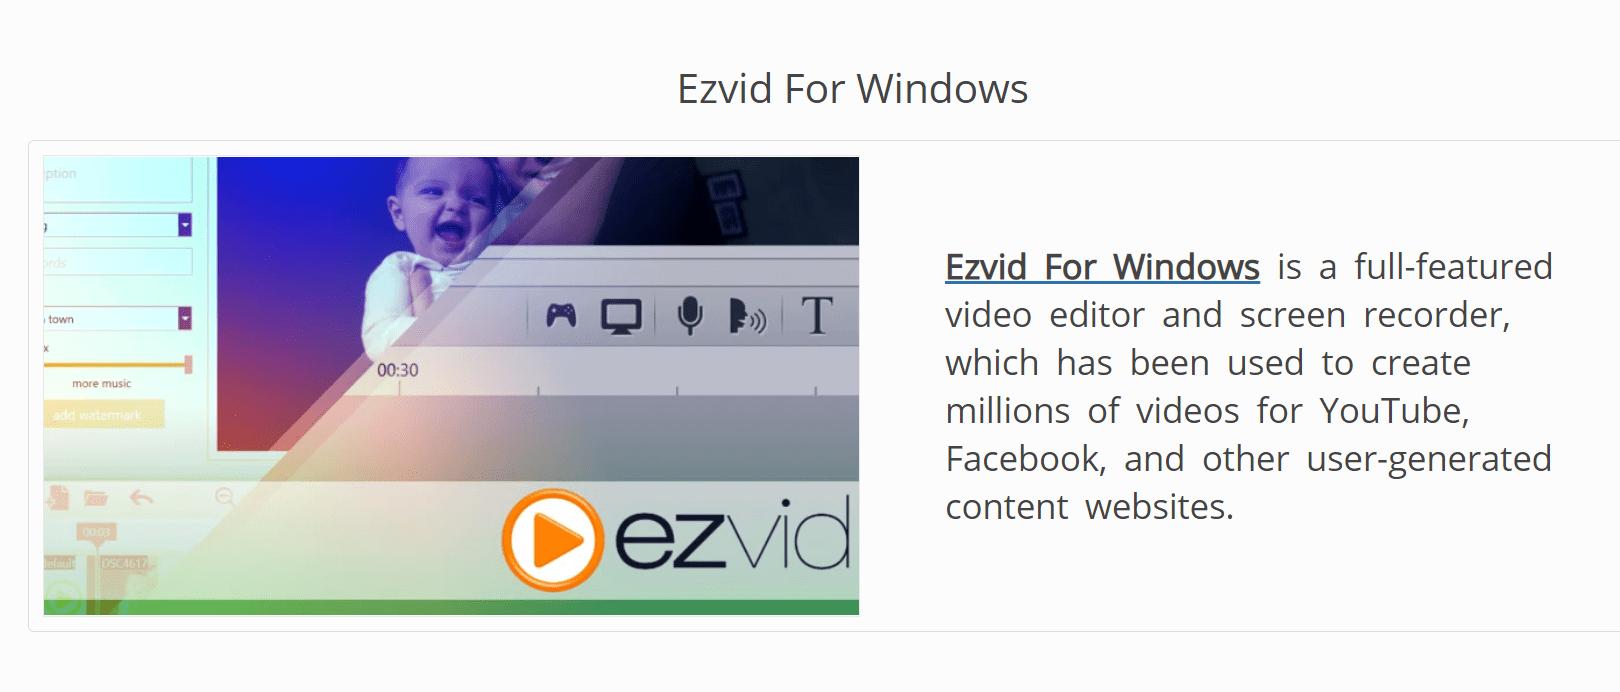 ezvid for windows